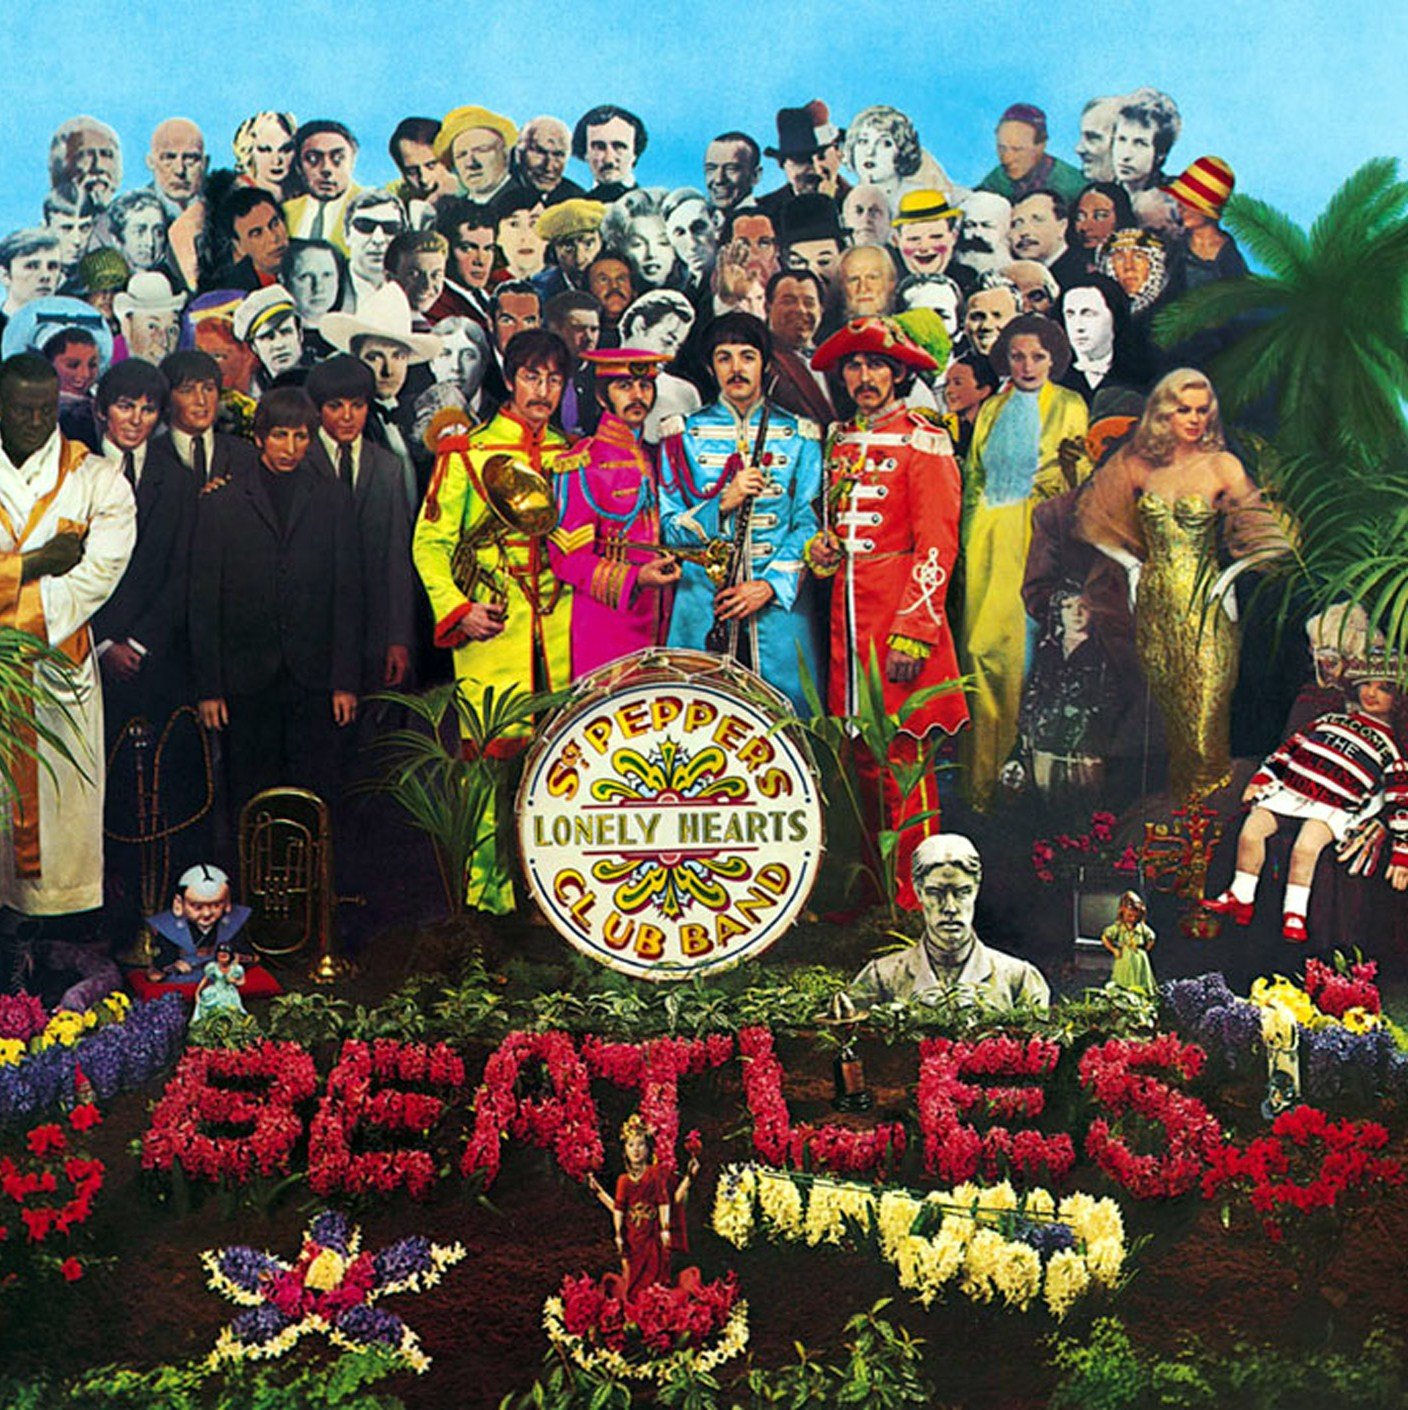 http://2.bp.blogspot.com/-4WT-BAQkEbU/TbVexvGs7BI/AAAAAAAABMk/IJtaZ4uxirw/s1600/Beatles-SgtPepper-Deluxe1-front1.jpg